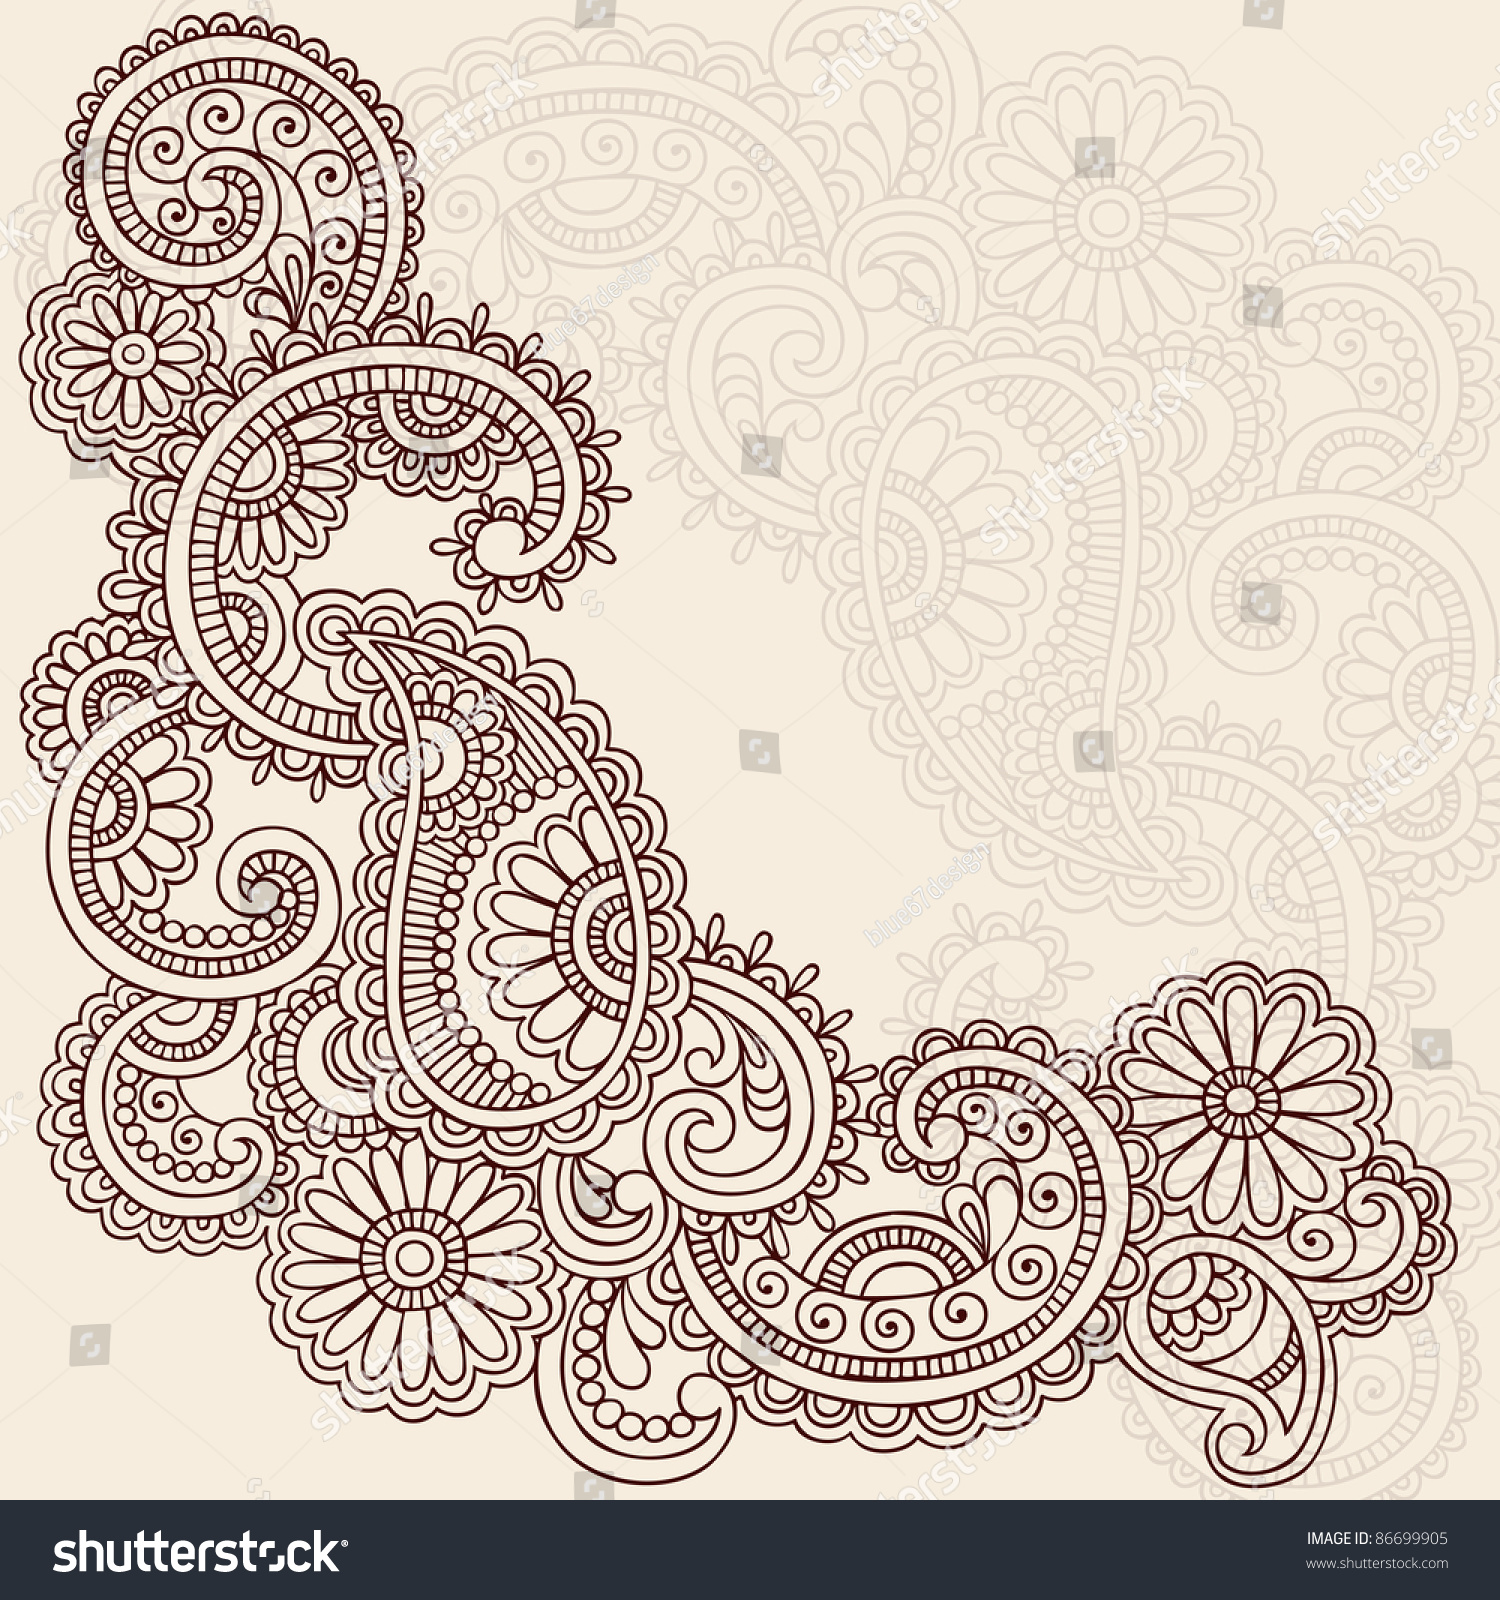 Mehndi Patterns Vector : Handdrawn abstract henna mehndi swirls flowers stock